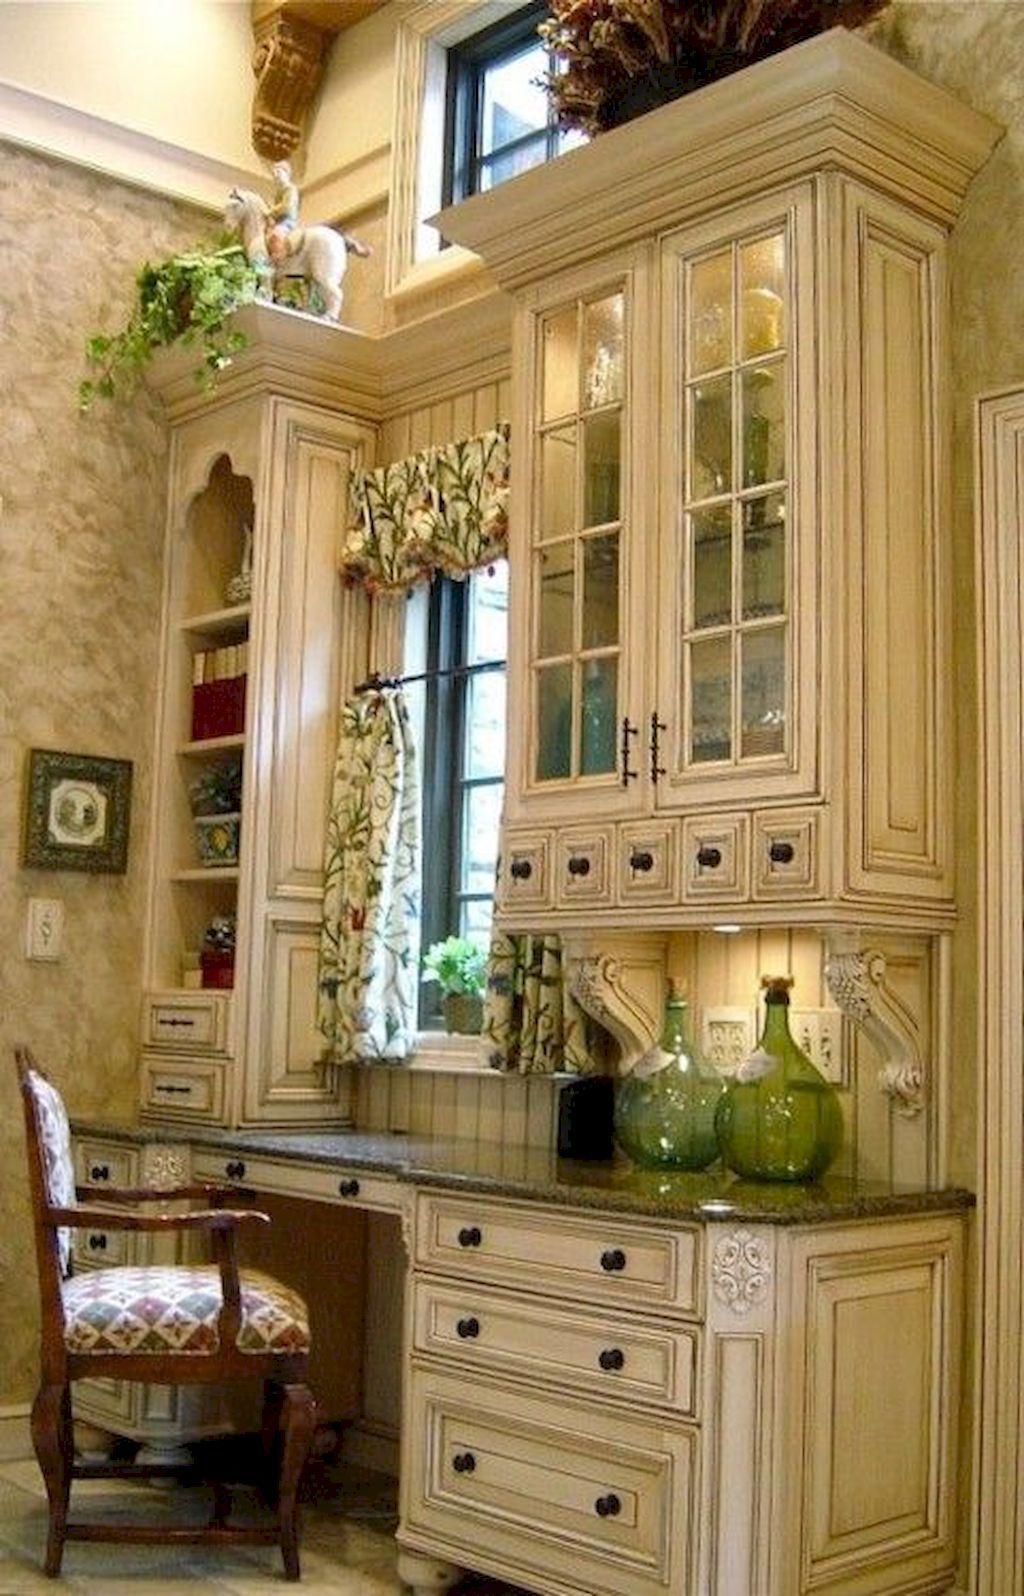 70 Incredible French Country Kitchen Design Ideas #kitchendesignideas